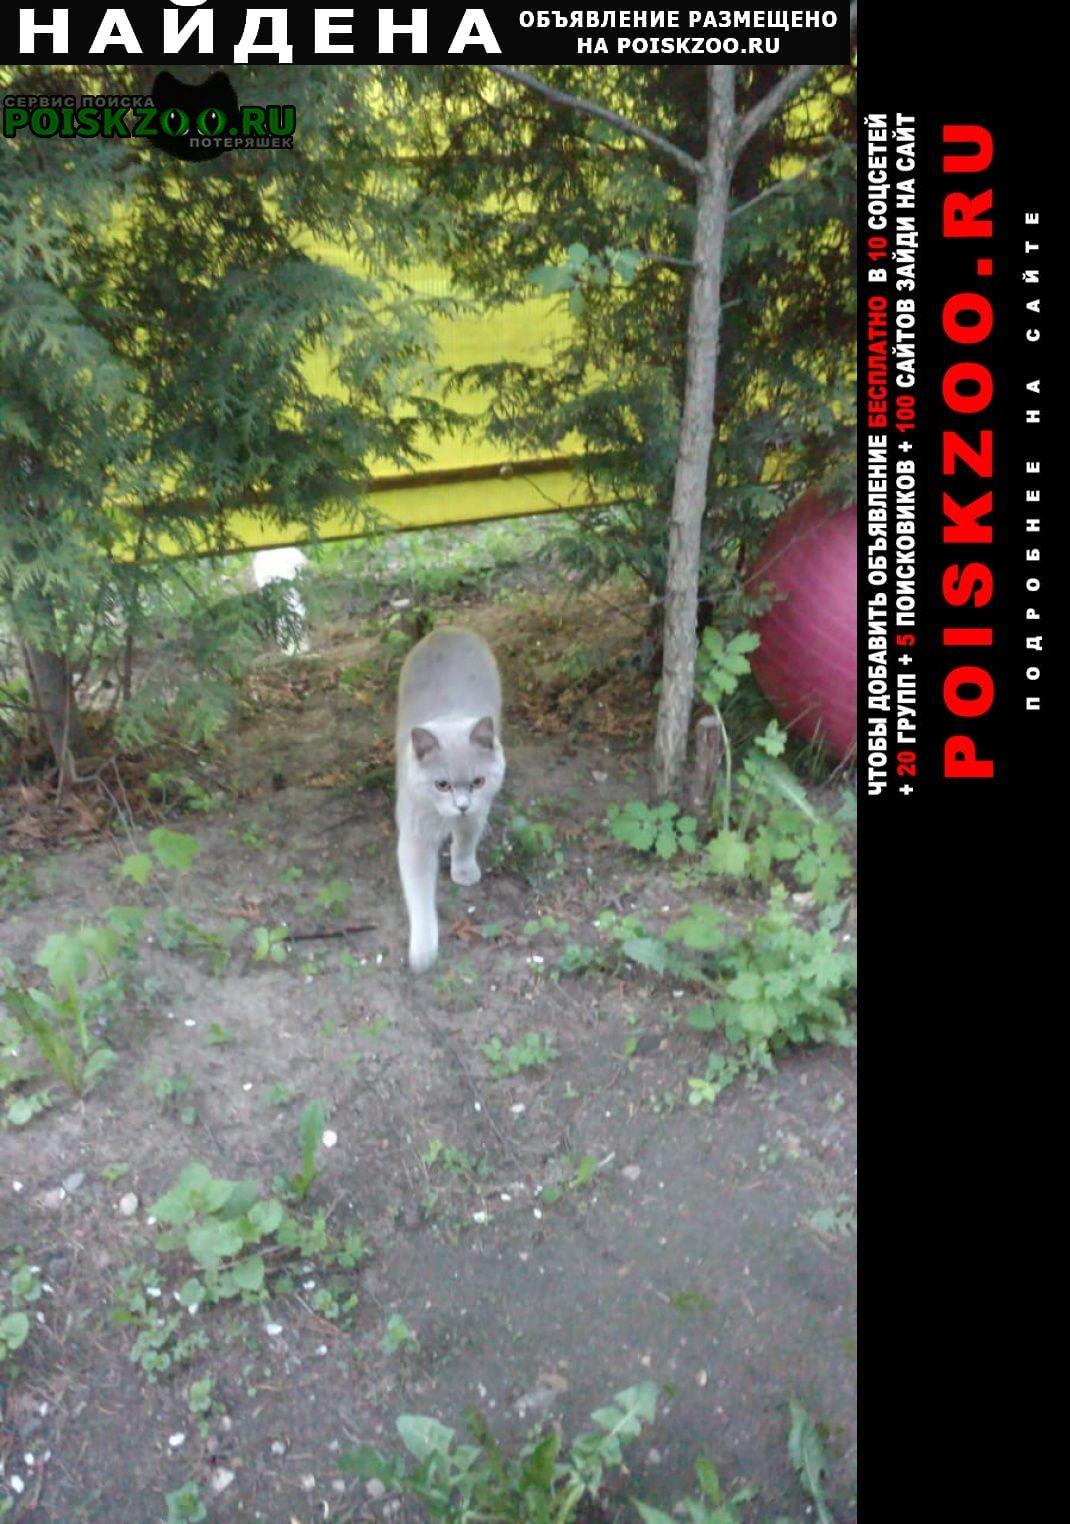 Найден кот -подросток британец Черкизово